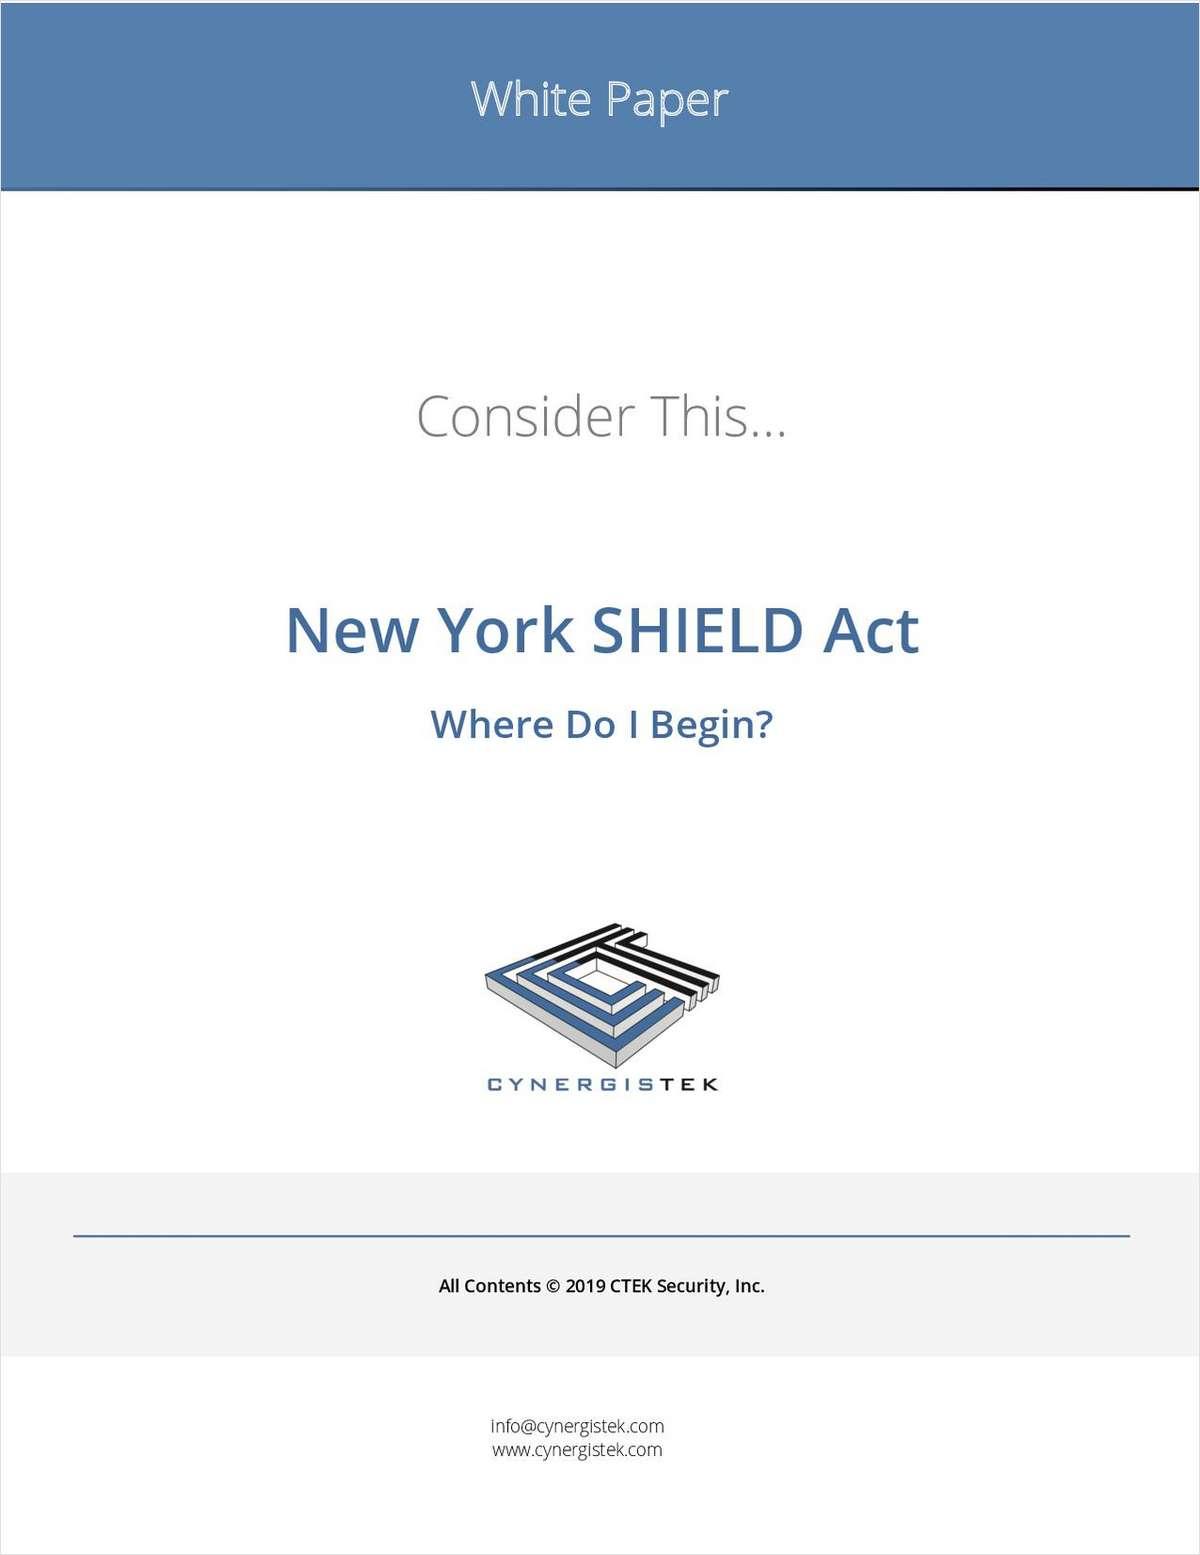 New York SHIELD Act: Where Do I Begin?